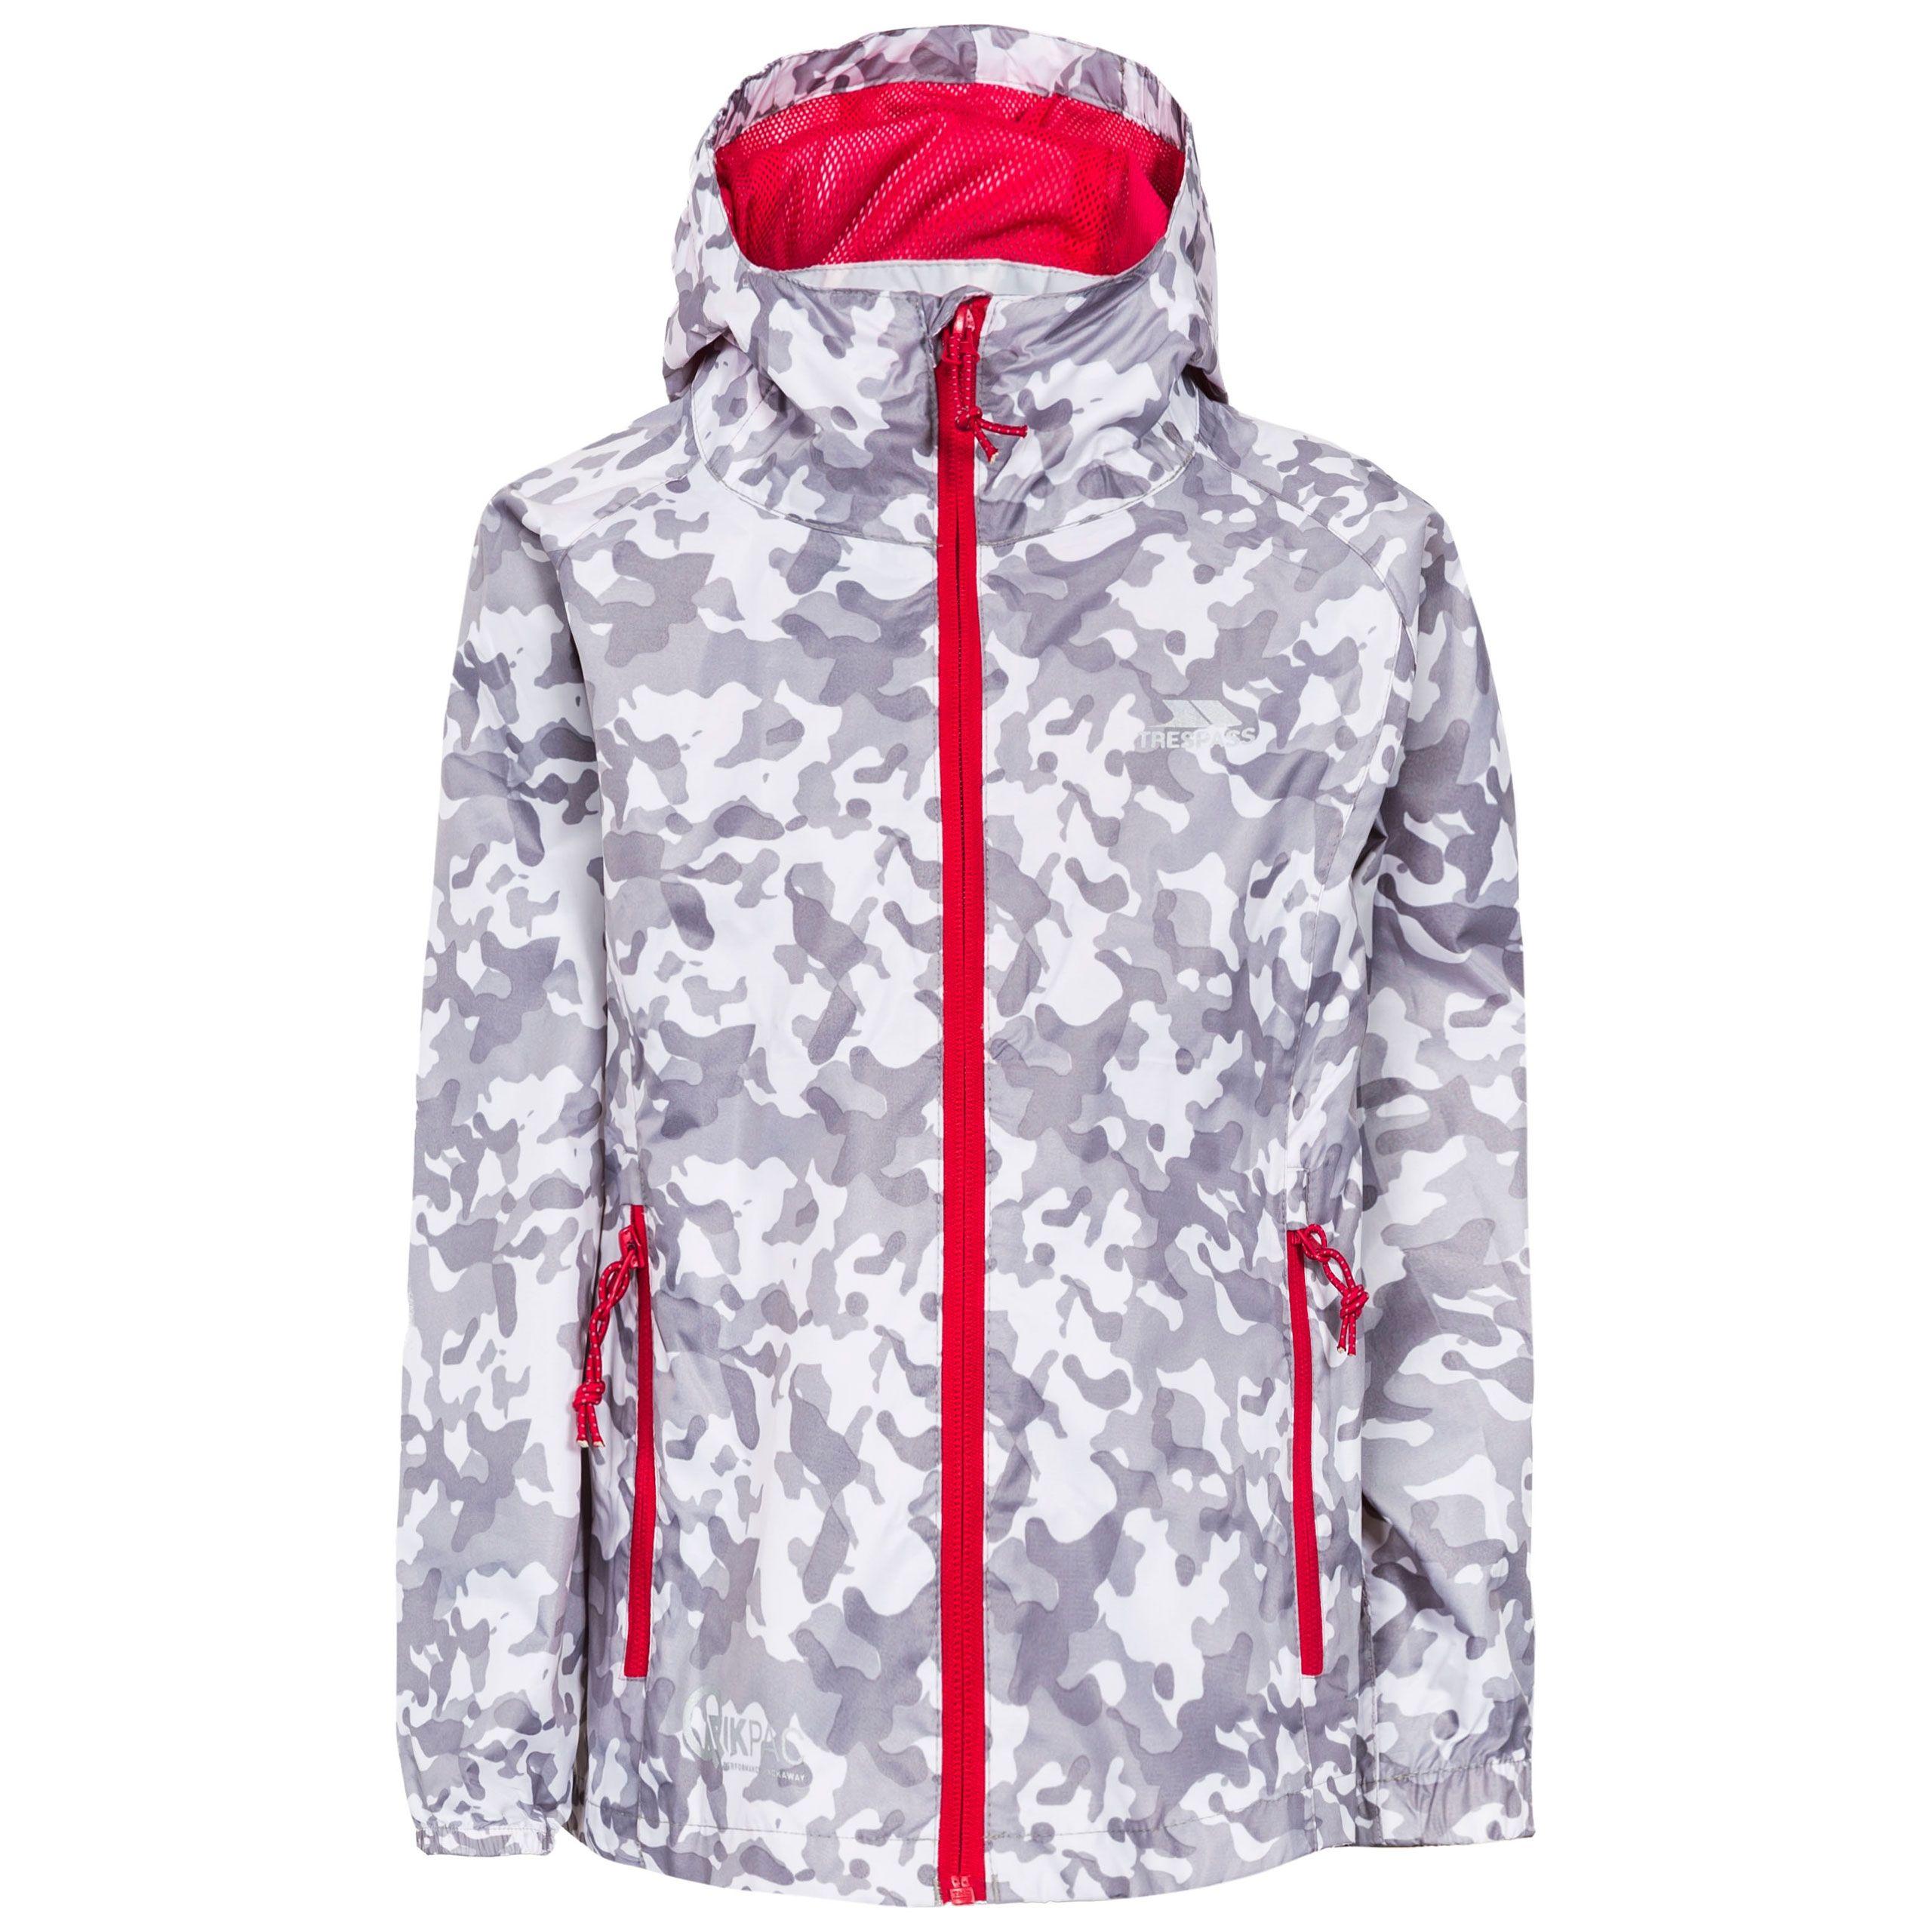 Trespass Kids Packaway Jacket Waterproof Camo Print Qikpac